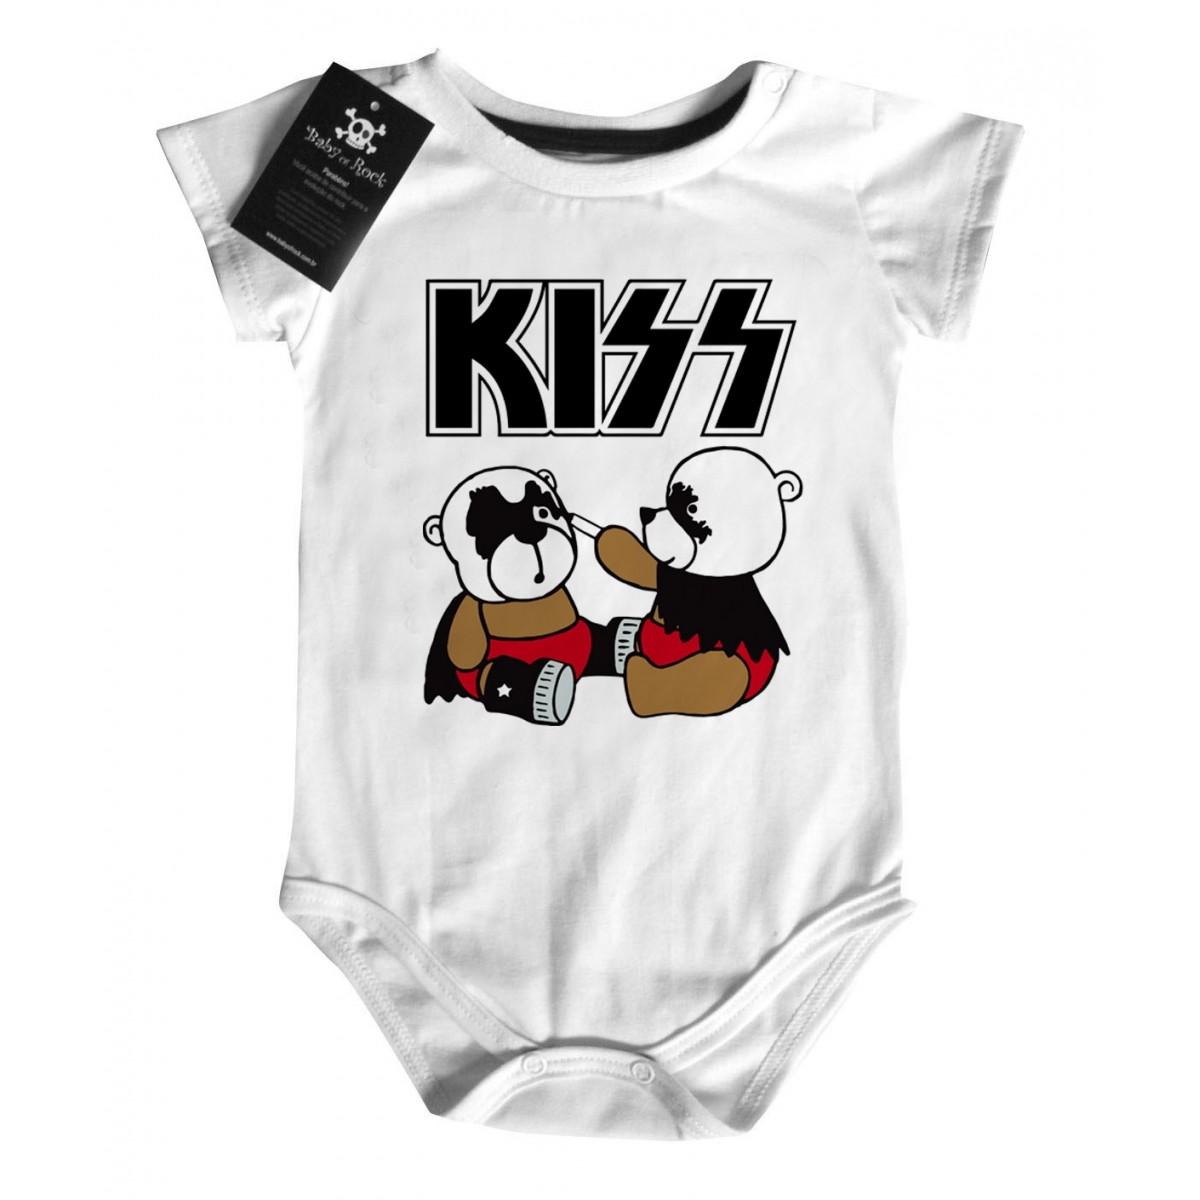 Body Bebê KISS - Cute -  White  - Baby Monster S/A